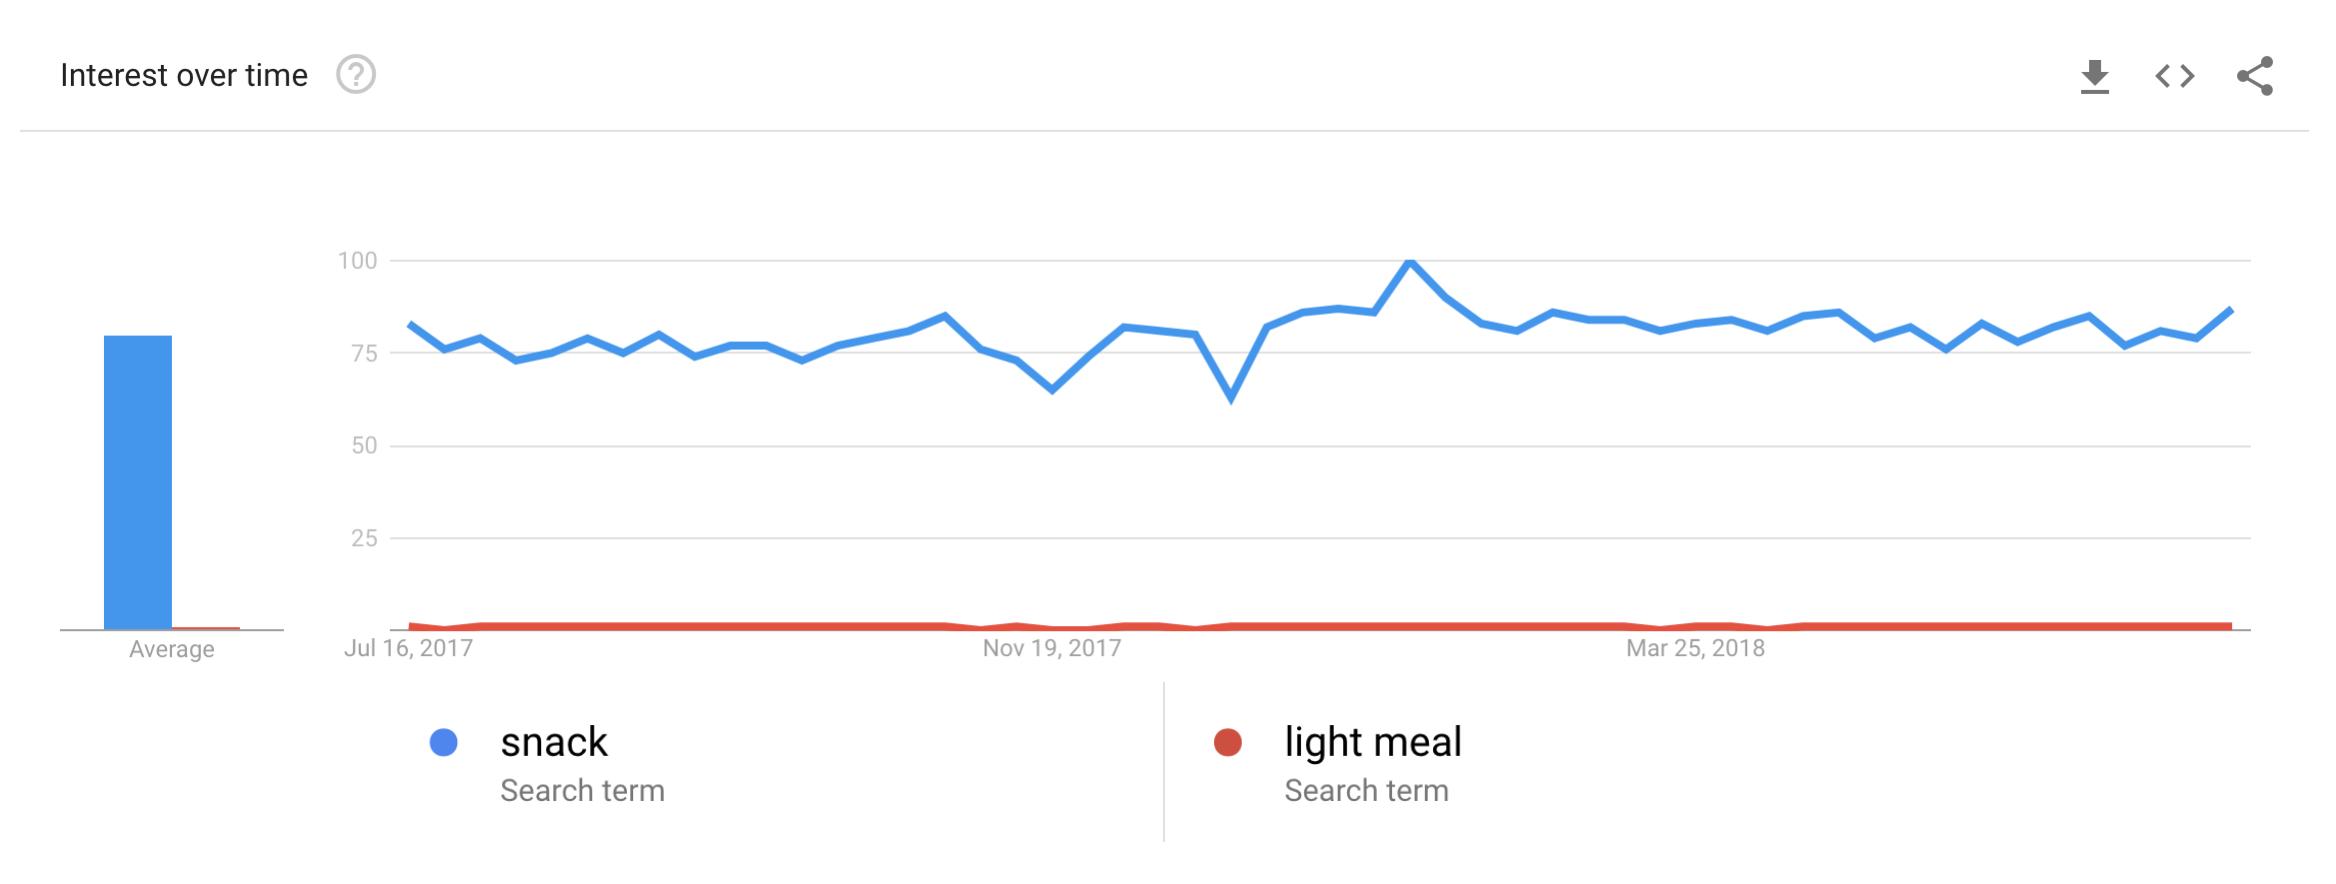 Google Trends of snack vs. light meal